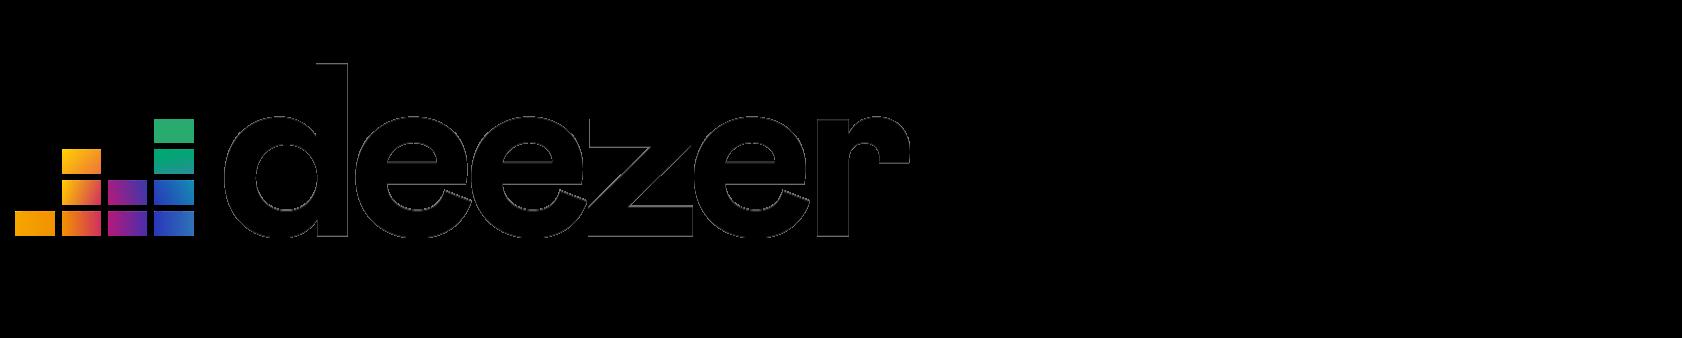 Deezer Communauté Logo